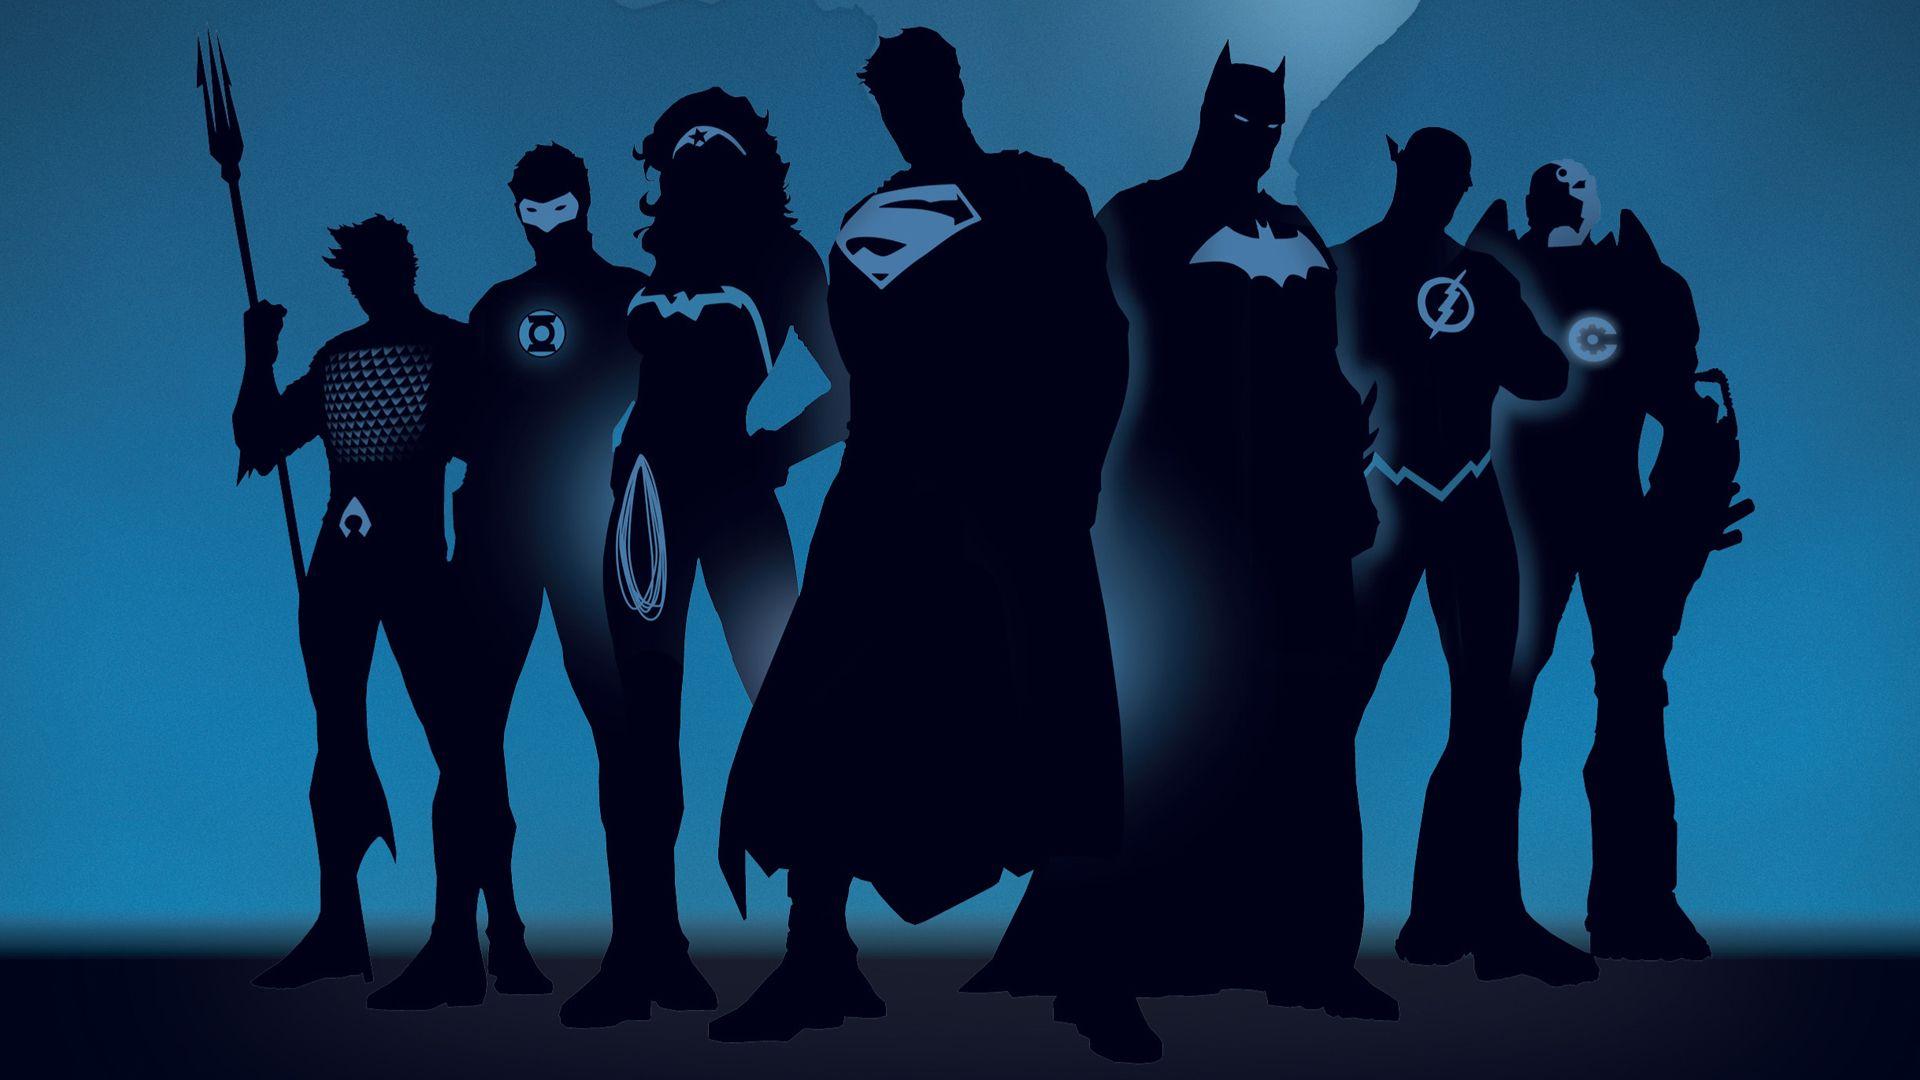 Justiceleague Aquaman Green Lantern Wonder Woman Superman Batman Flash Wallpa Superhero Silhouette Dc Comics Wallpaper Justice League Characters